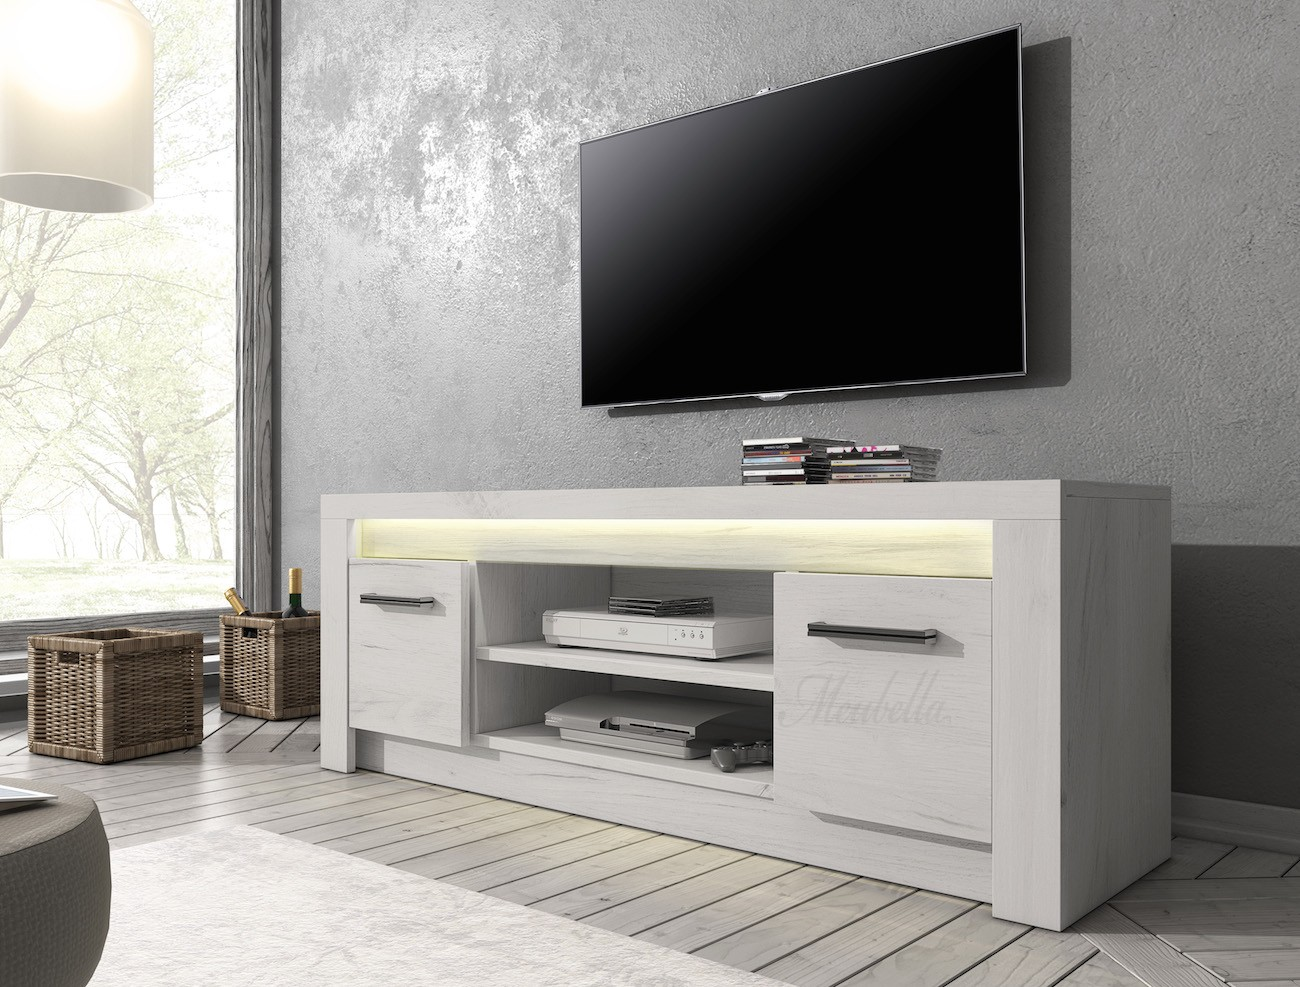 Tv meubel invido wit 137 cm actie meubella for Tv meubel design outlet